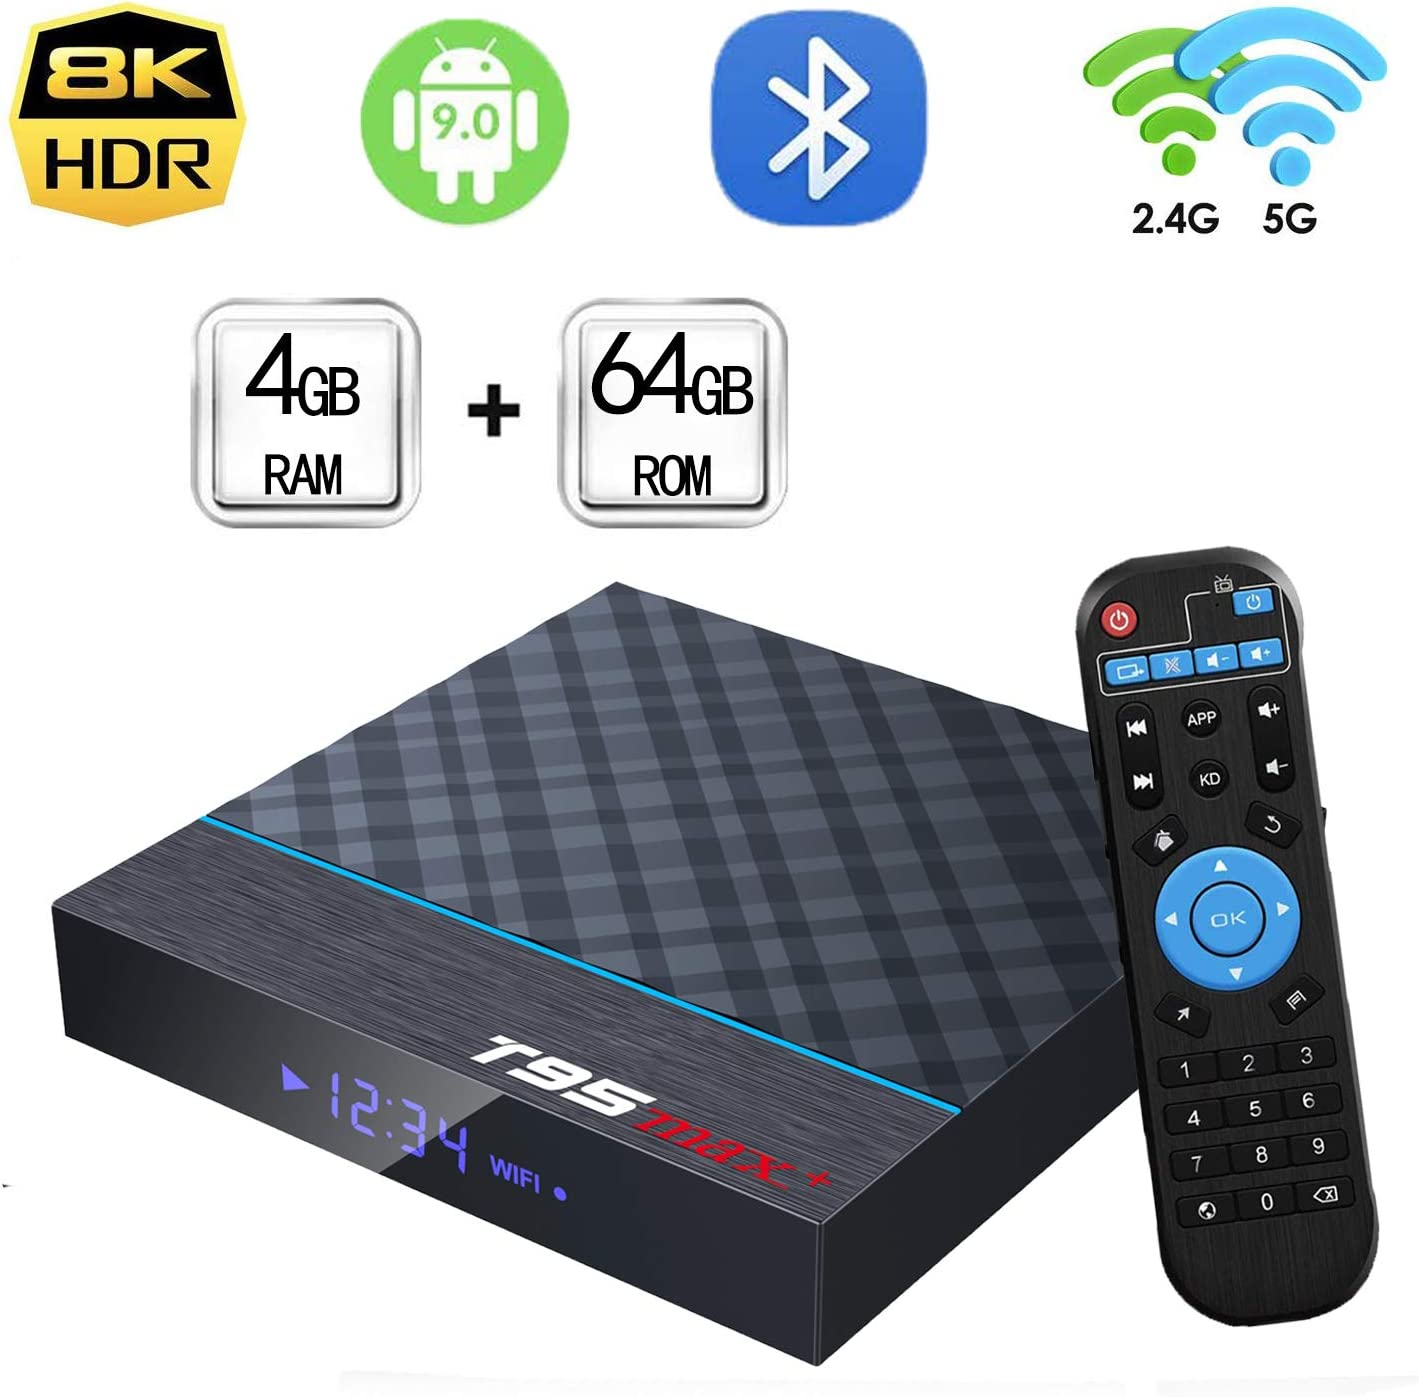 Easytone Android TV Box 9.0 4GB RAM 64GB ROM, T95MAX+ Android Box Amlogic S905X3 Quad-Core Dual Band WiFi 2.4G/5G BT4.0 4K8K 3D H.265 Decodificador USB 3.0 Internet Smart TV Box Media Player: